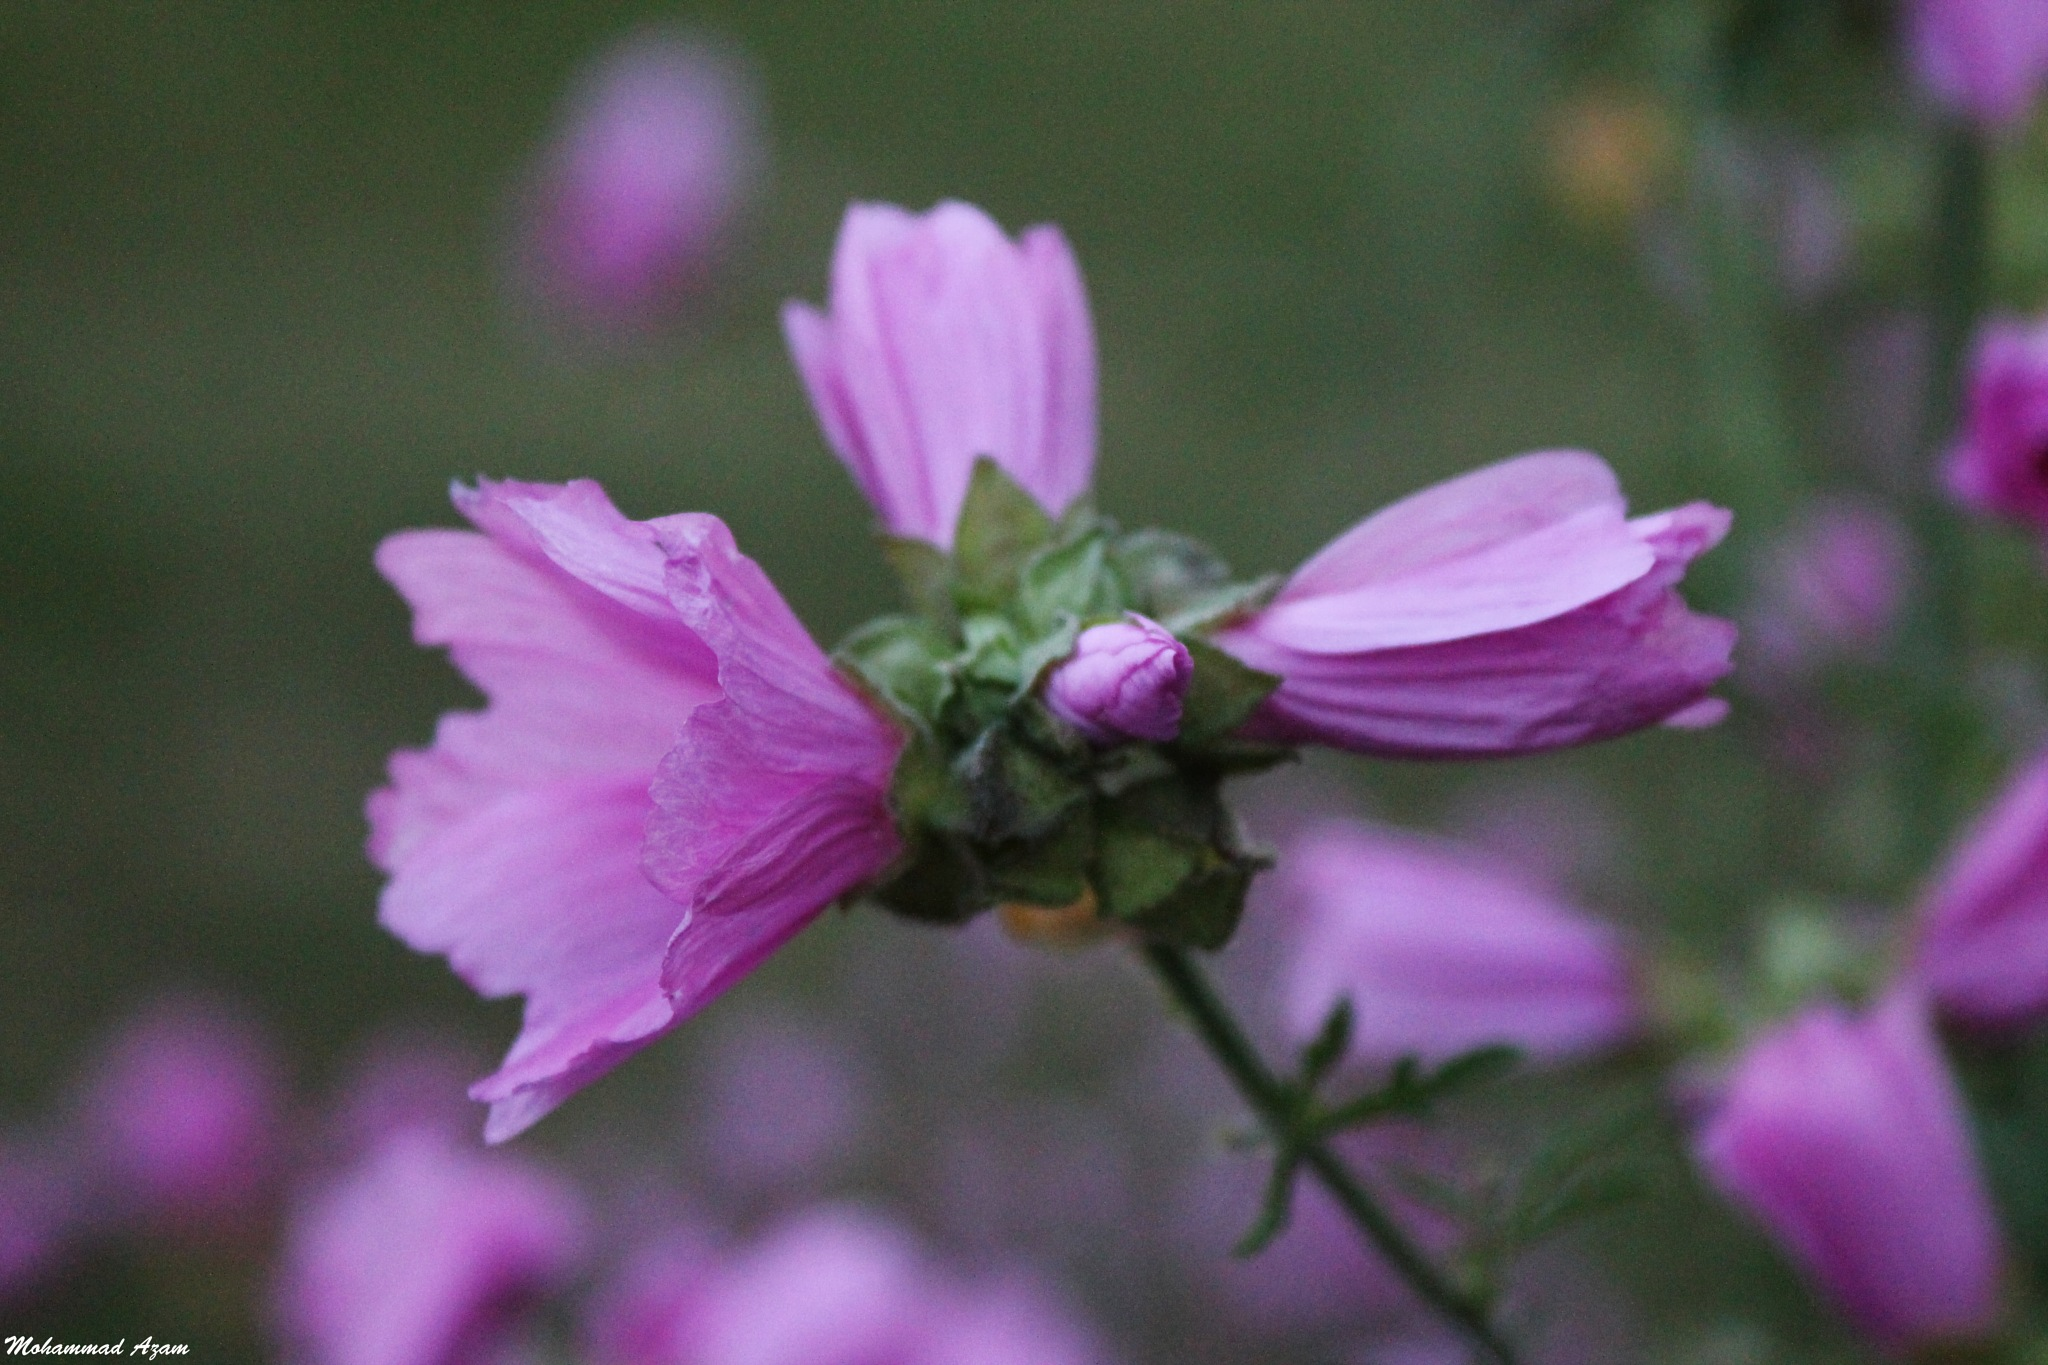 Flower 39 by Mohammad Azam